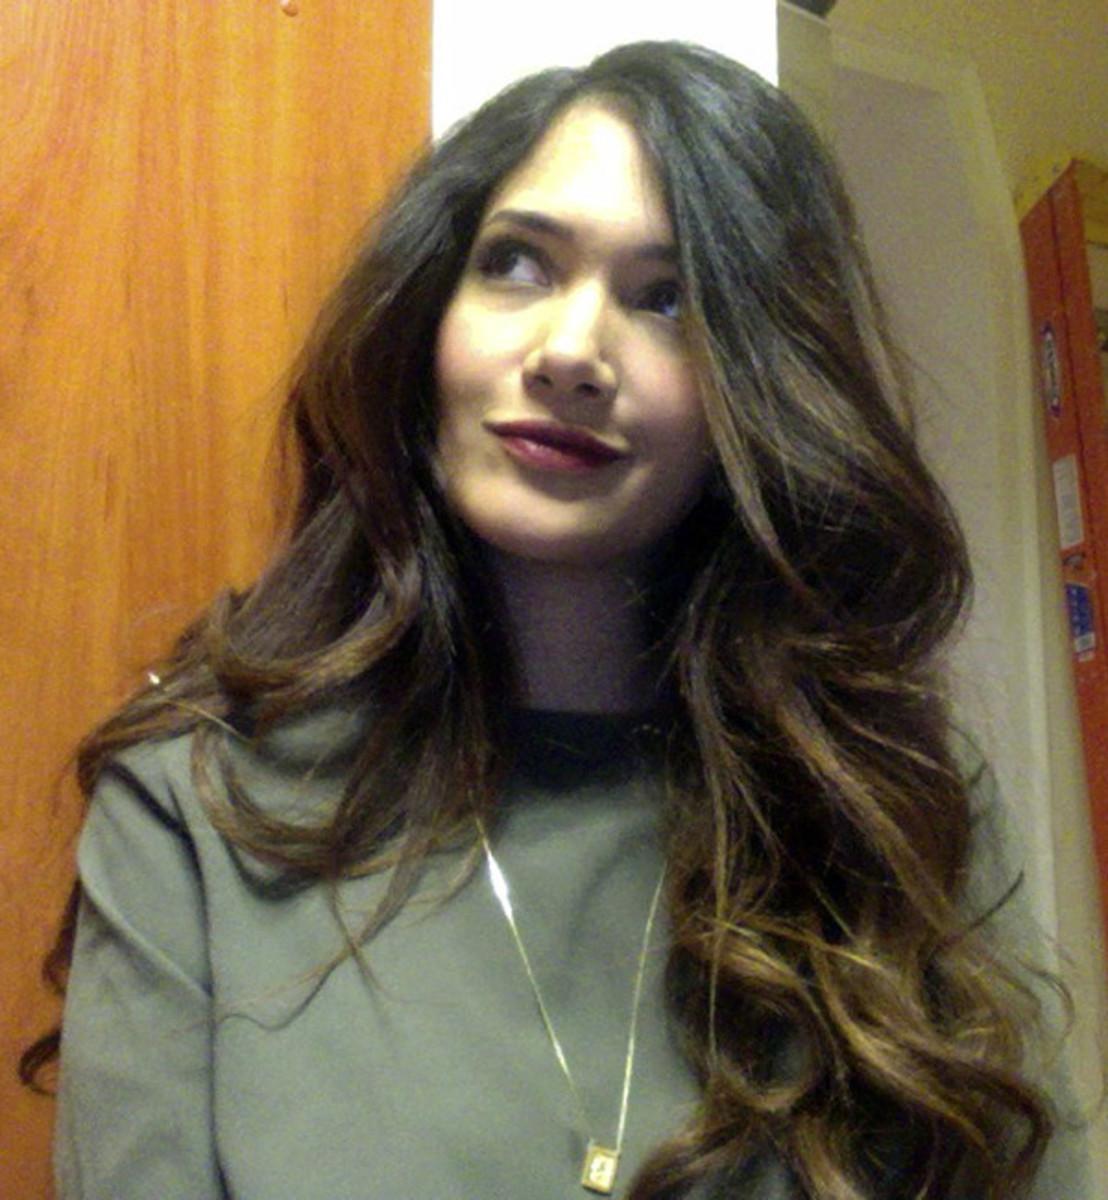 Hair consultation - Yohanca